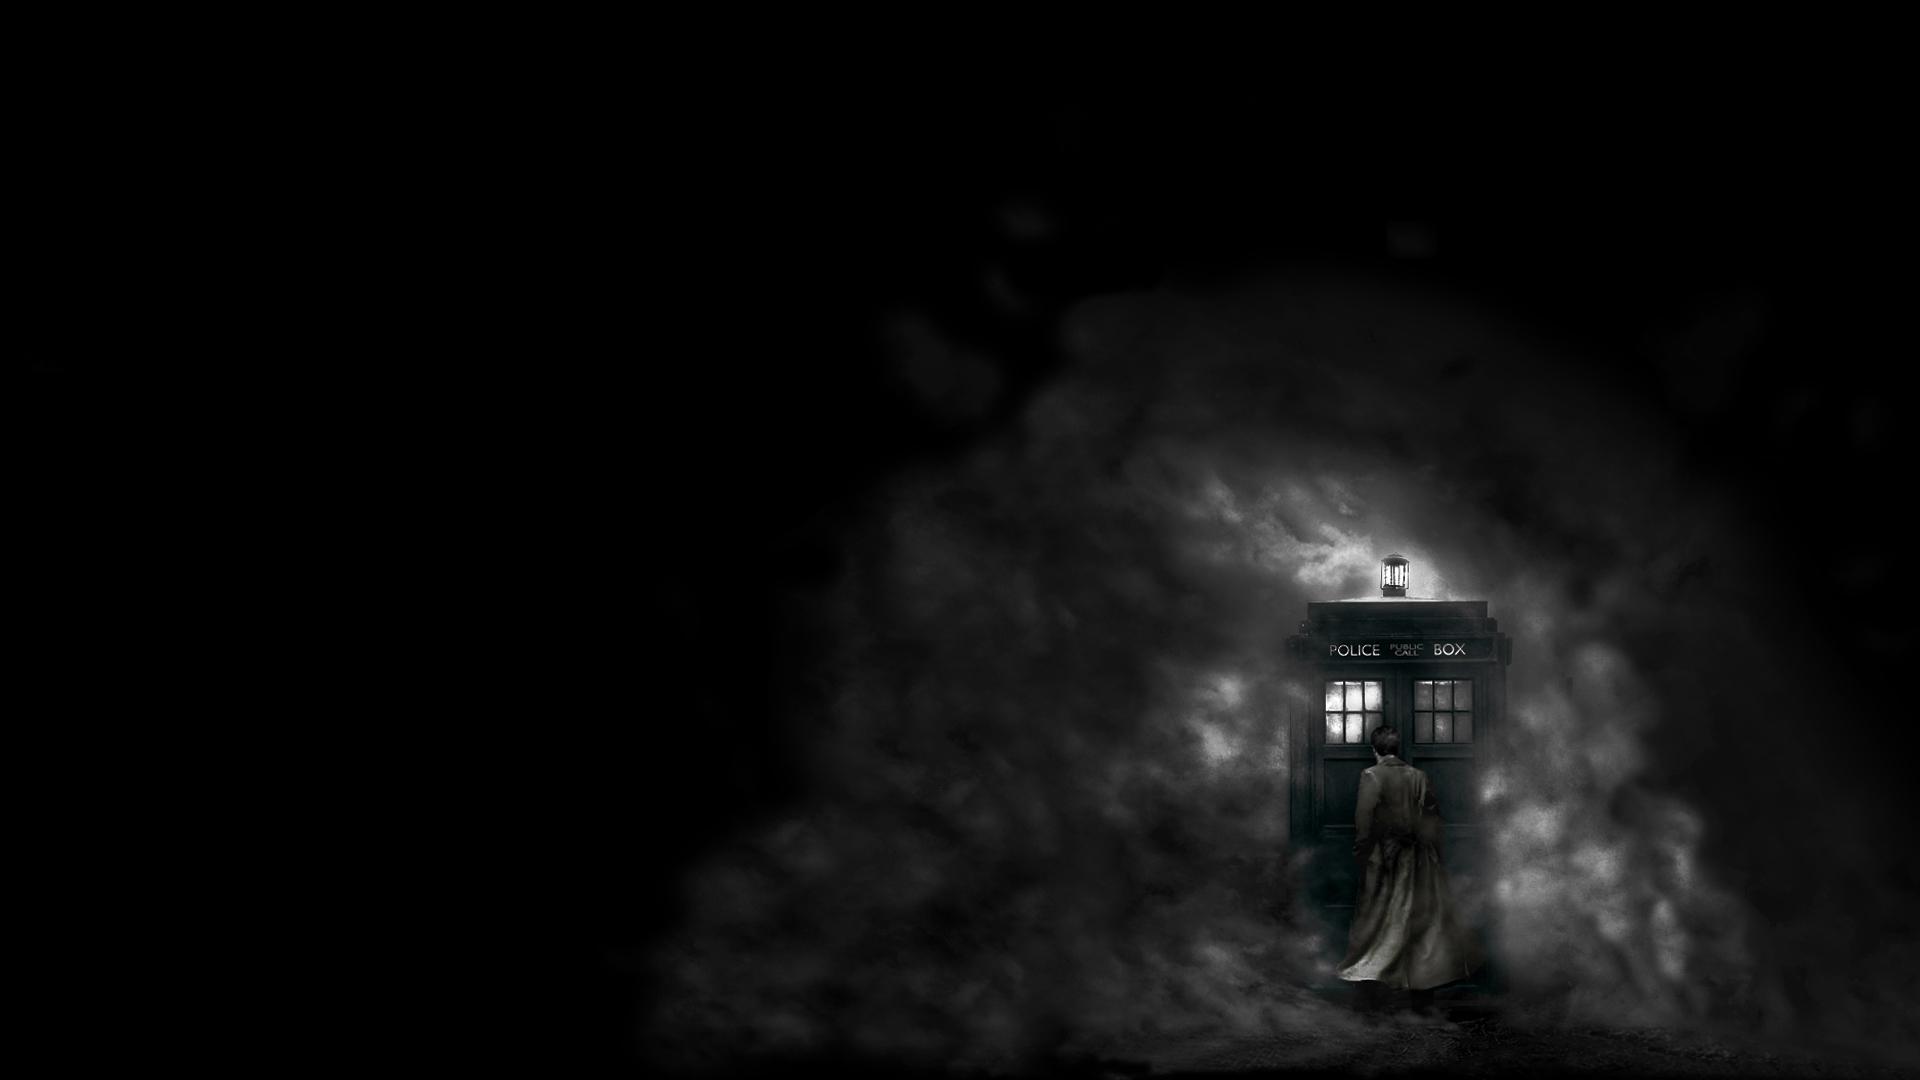 49 Doctor Who Hd Wallpaper 1920x1080 On Wallpapersafari